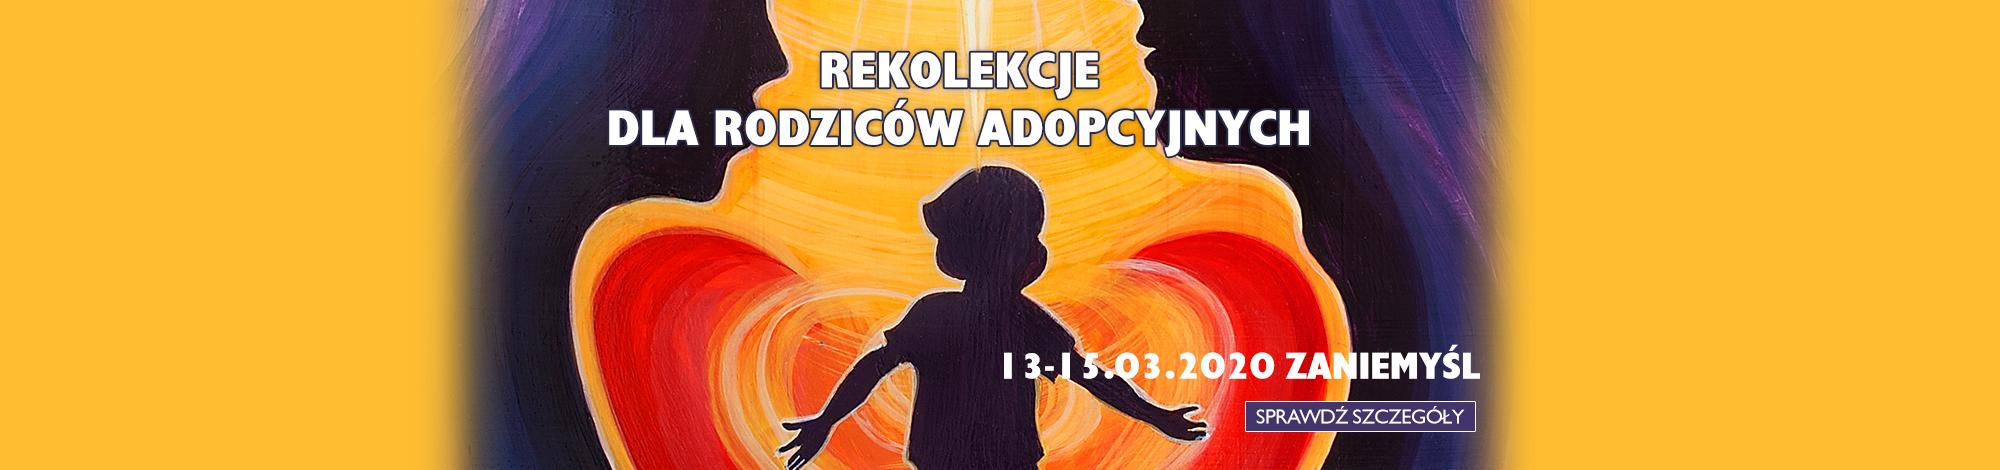 slide_adopcja_2020